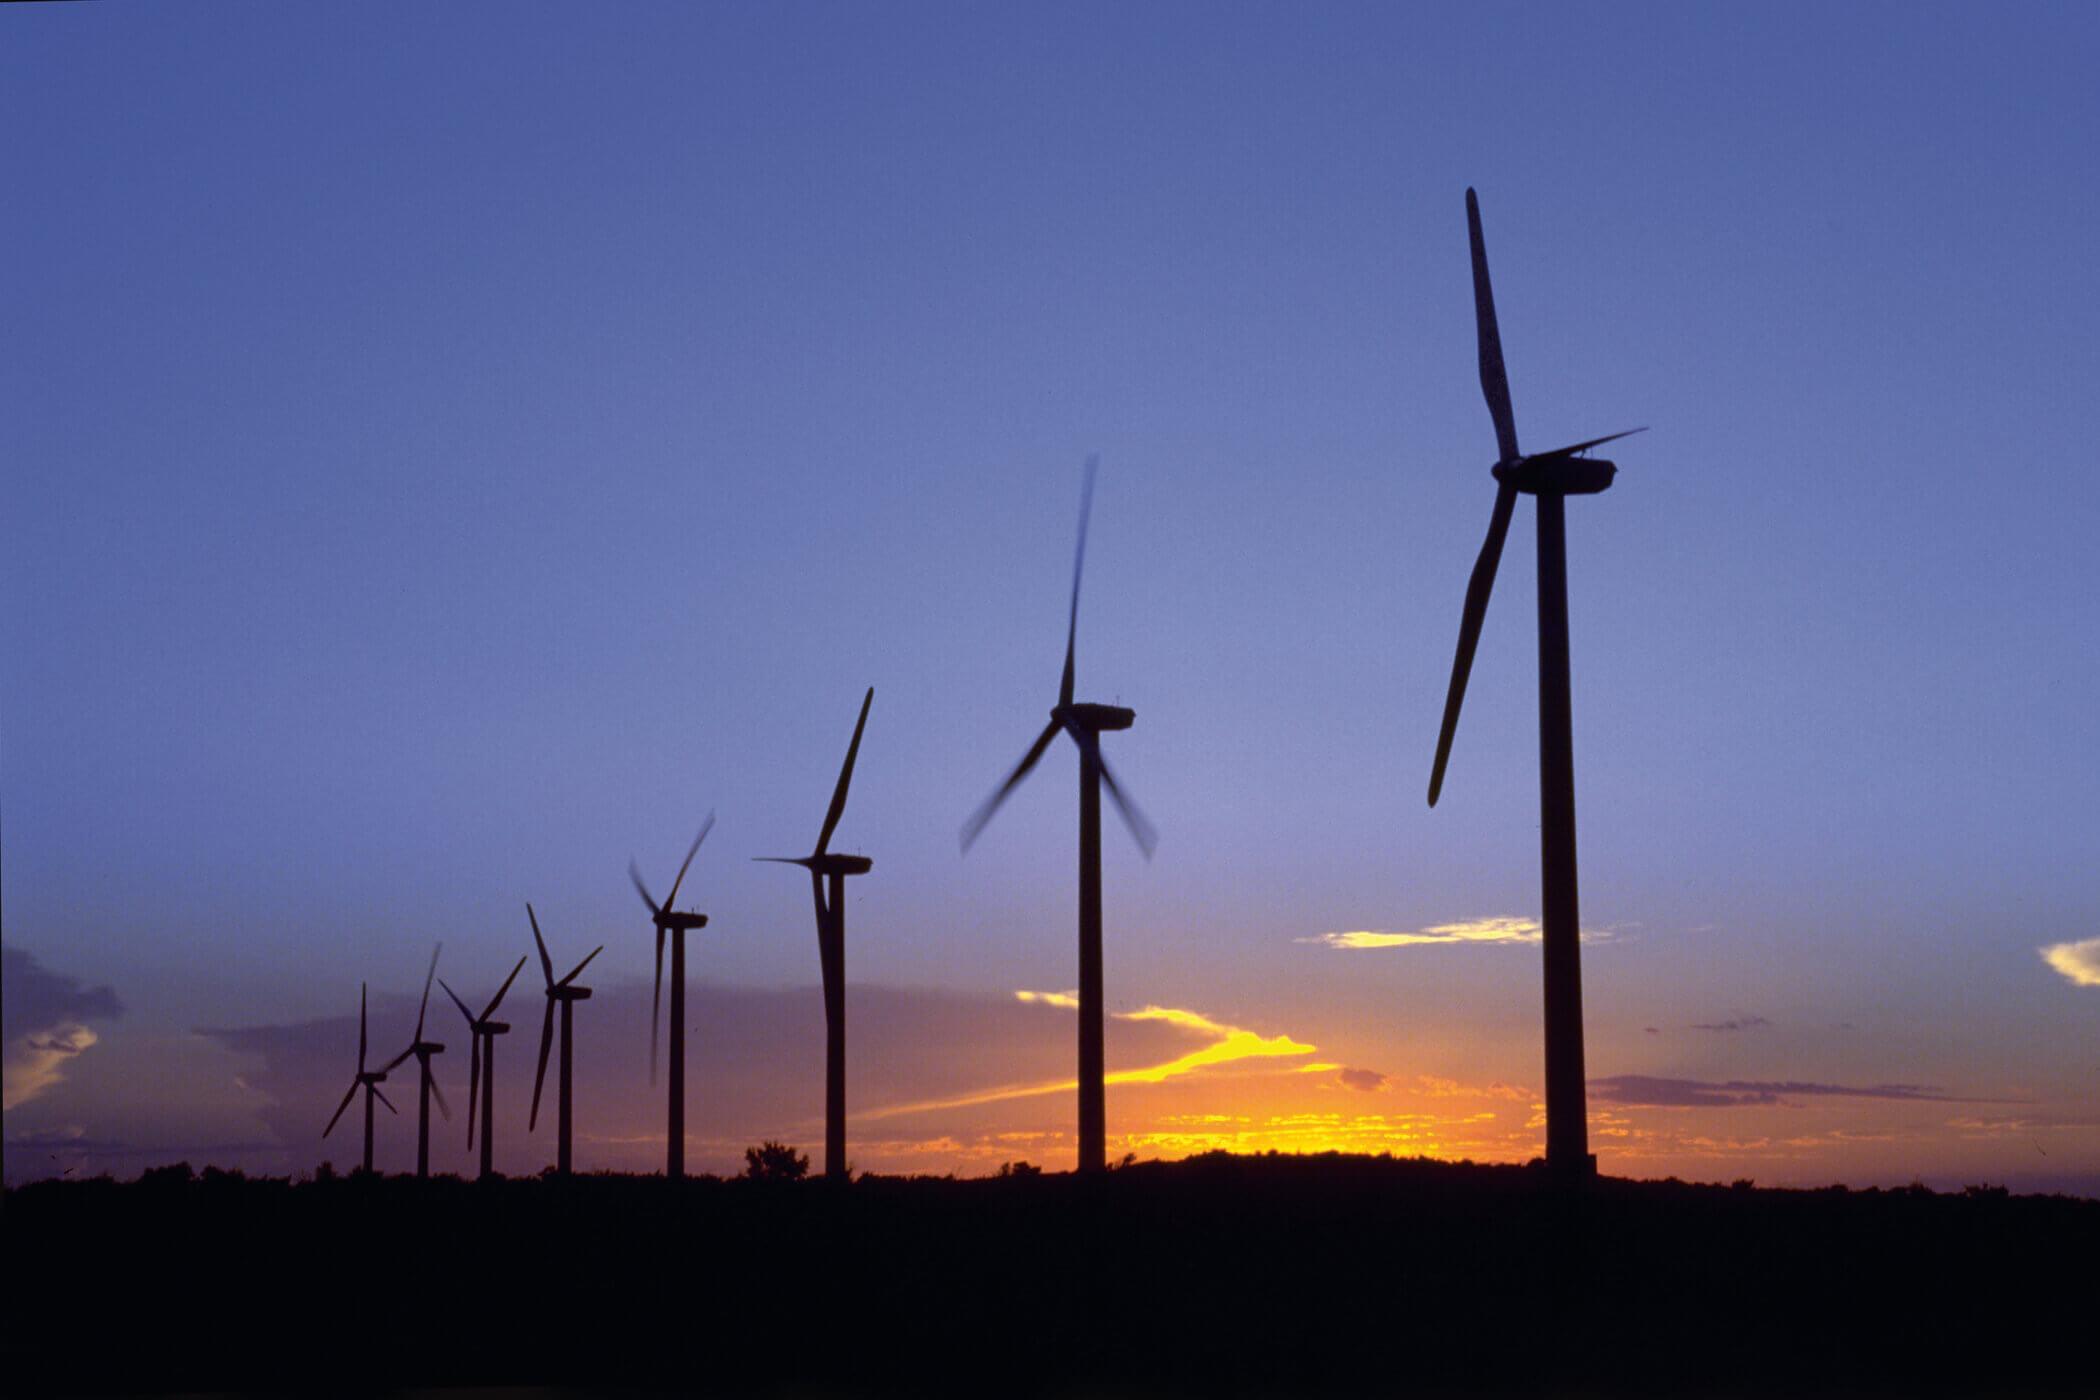 Movie Theater Company Cinemark Inks Texas Wind Agreement